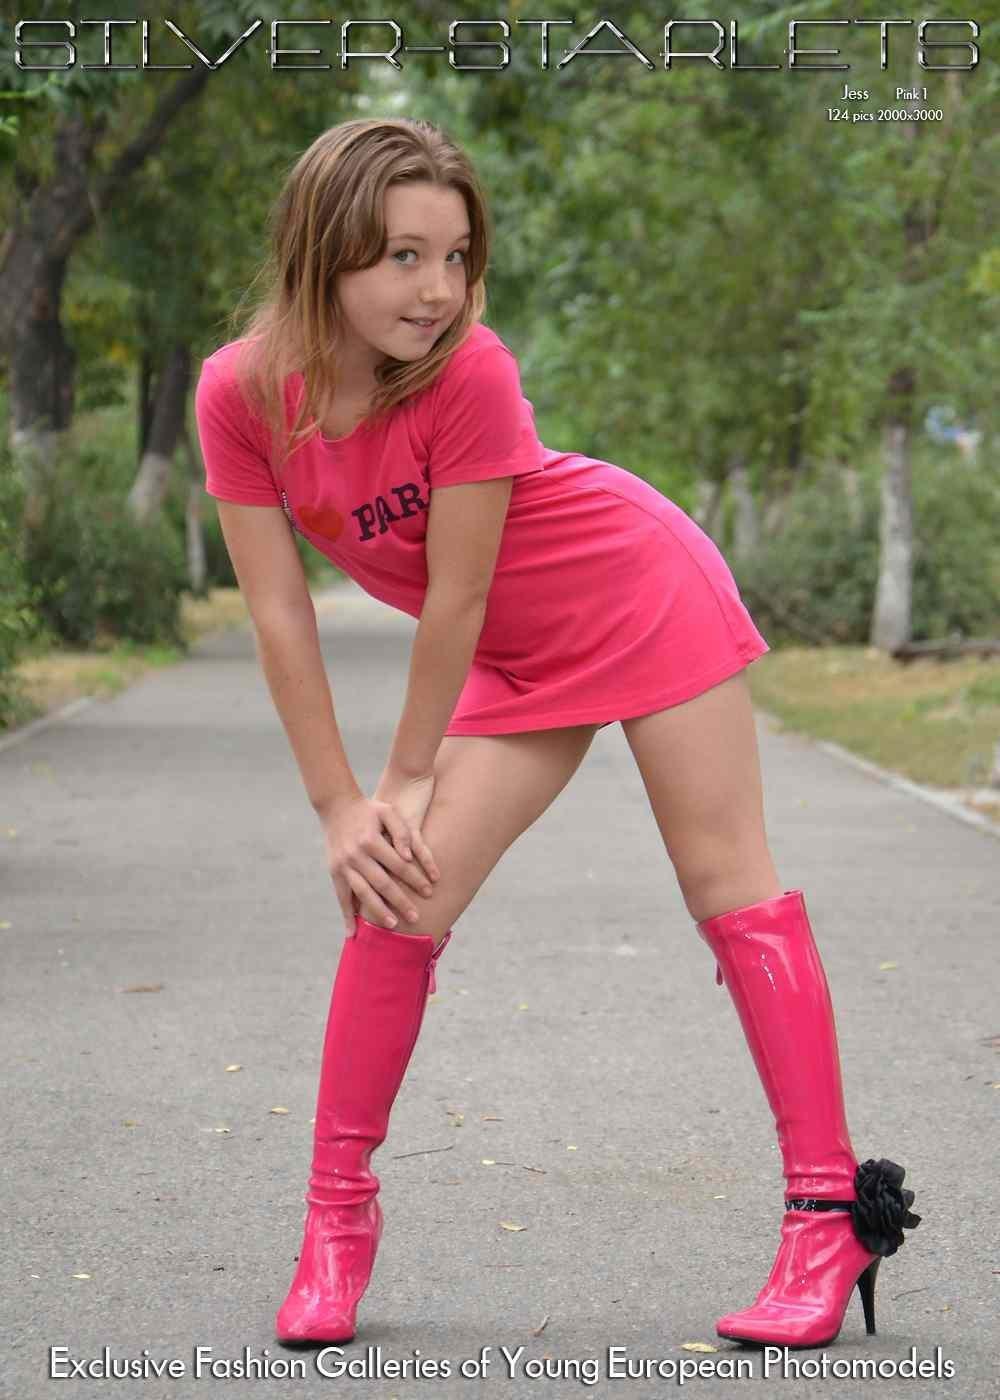 Model Jess